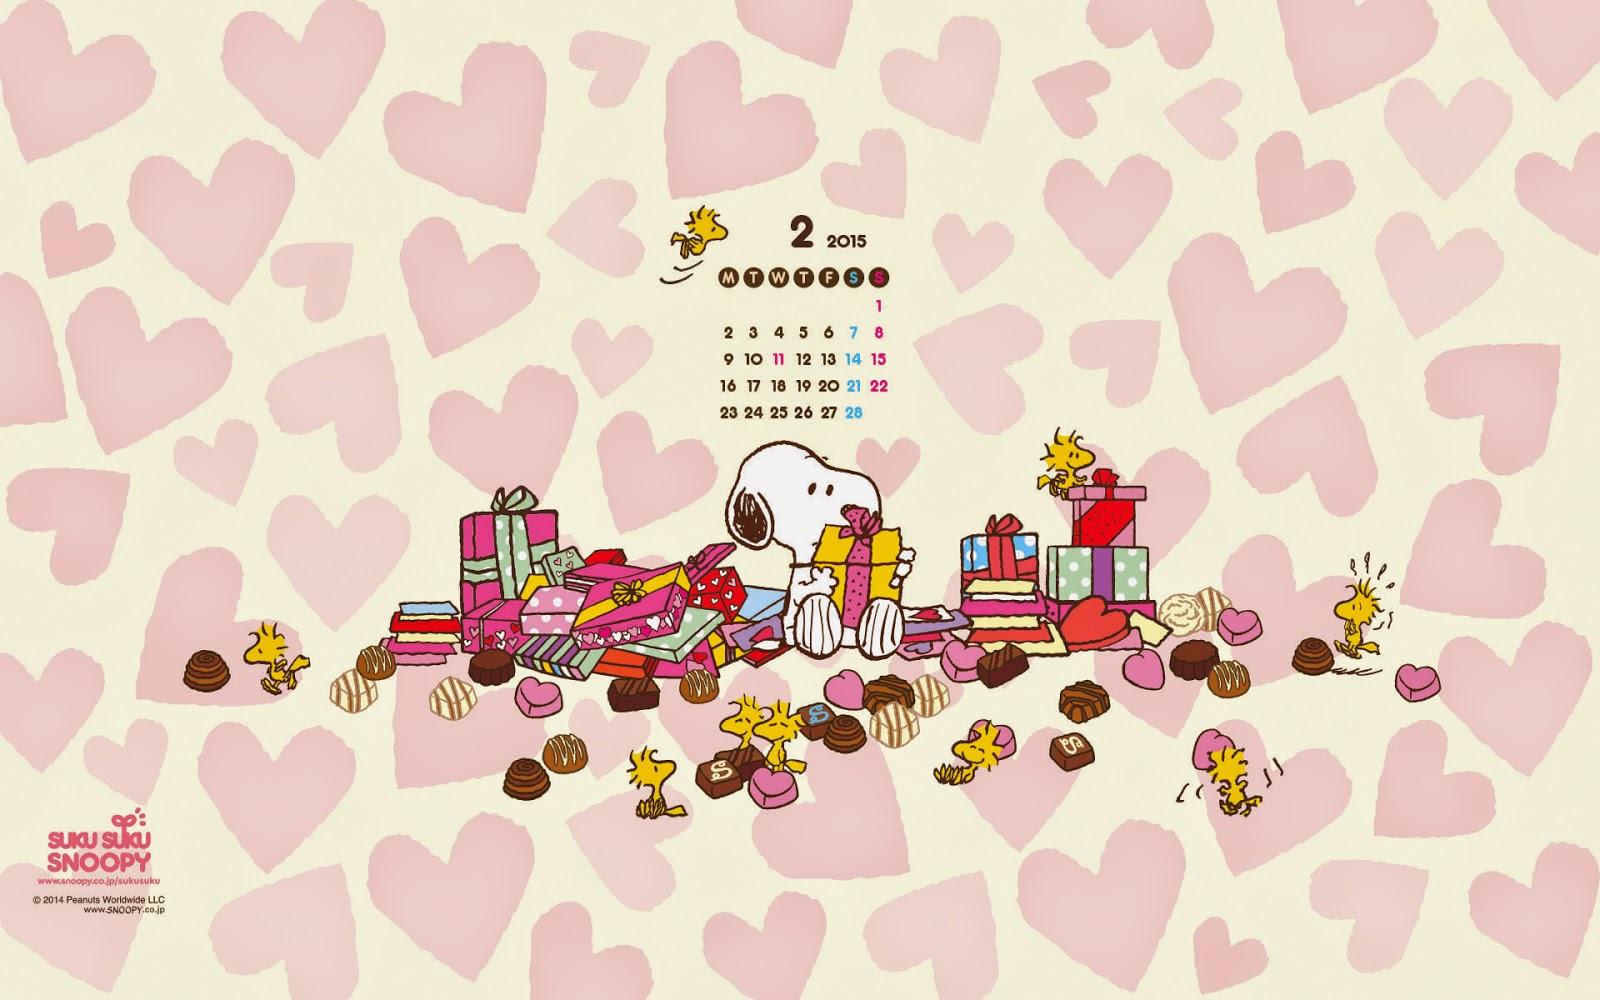 snoopy February 2015 calendar